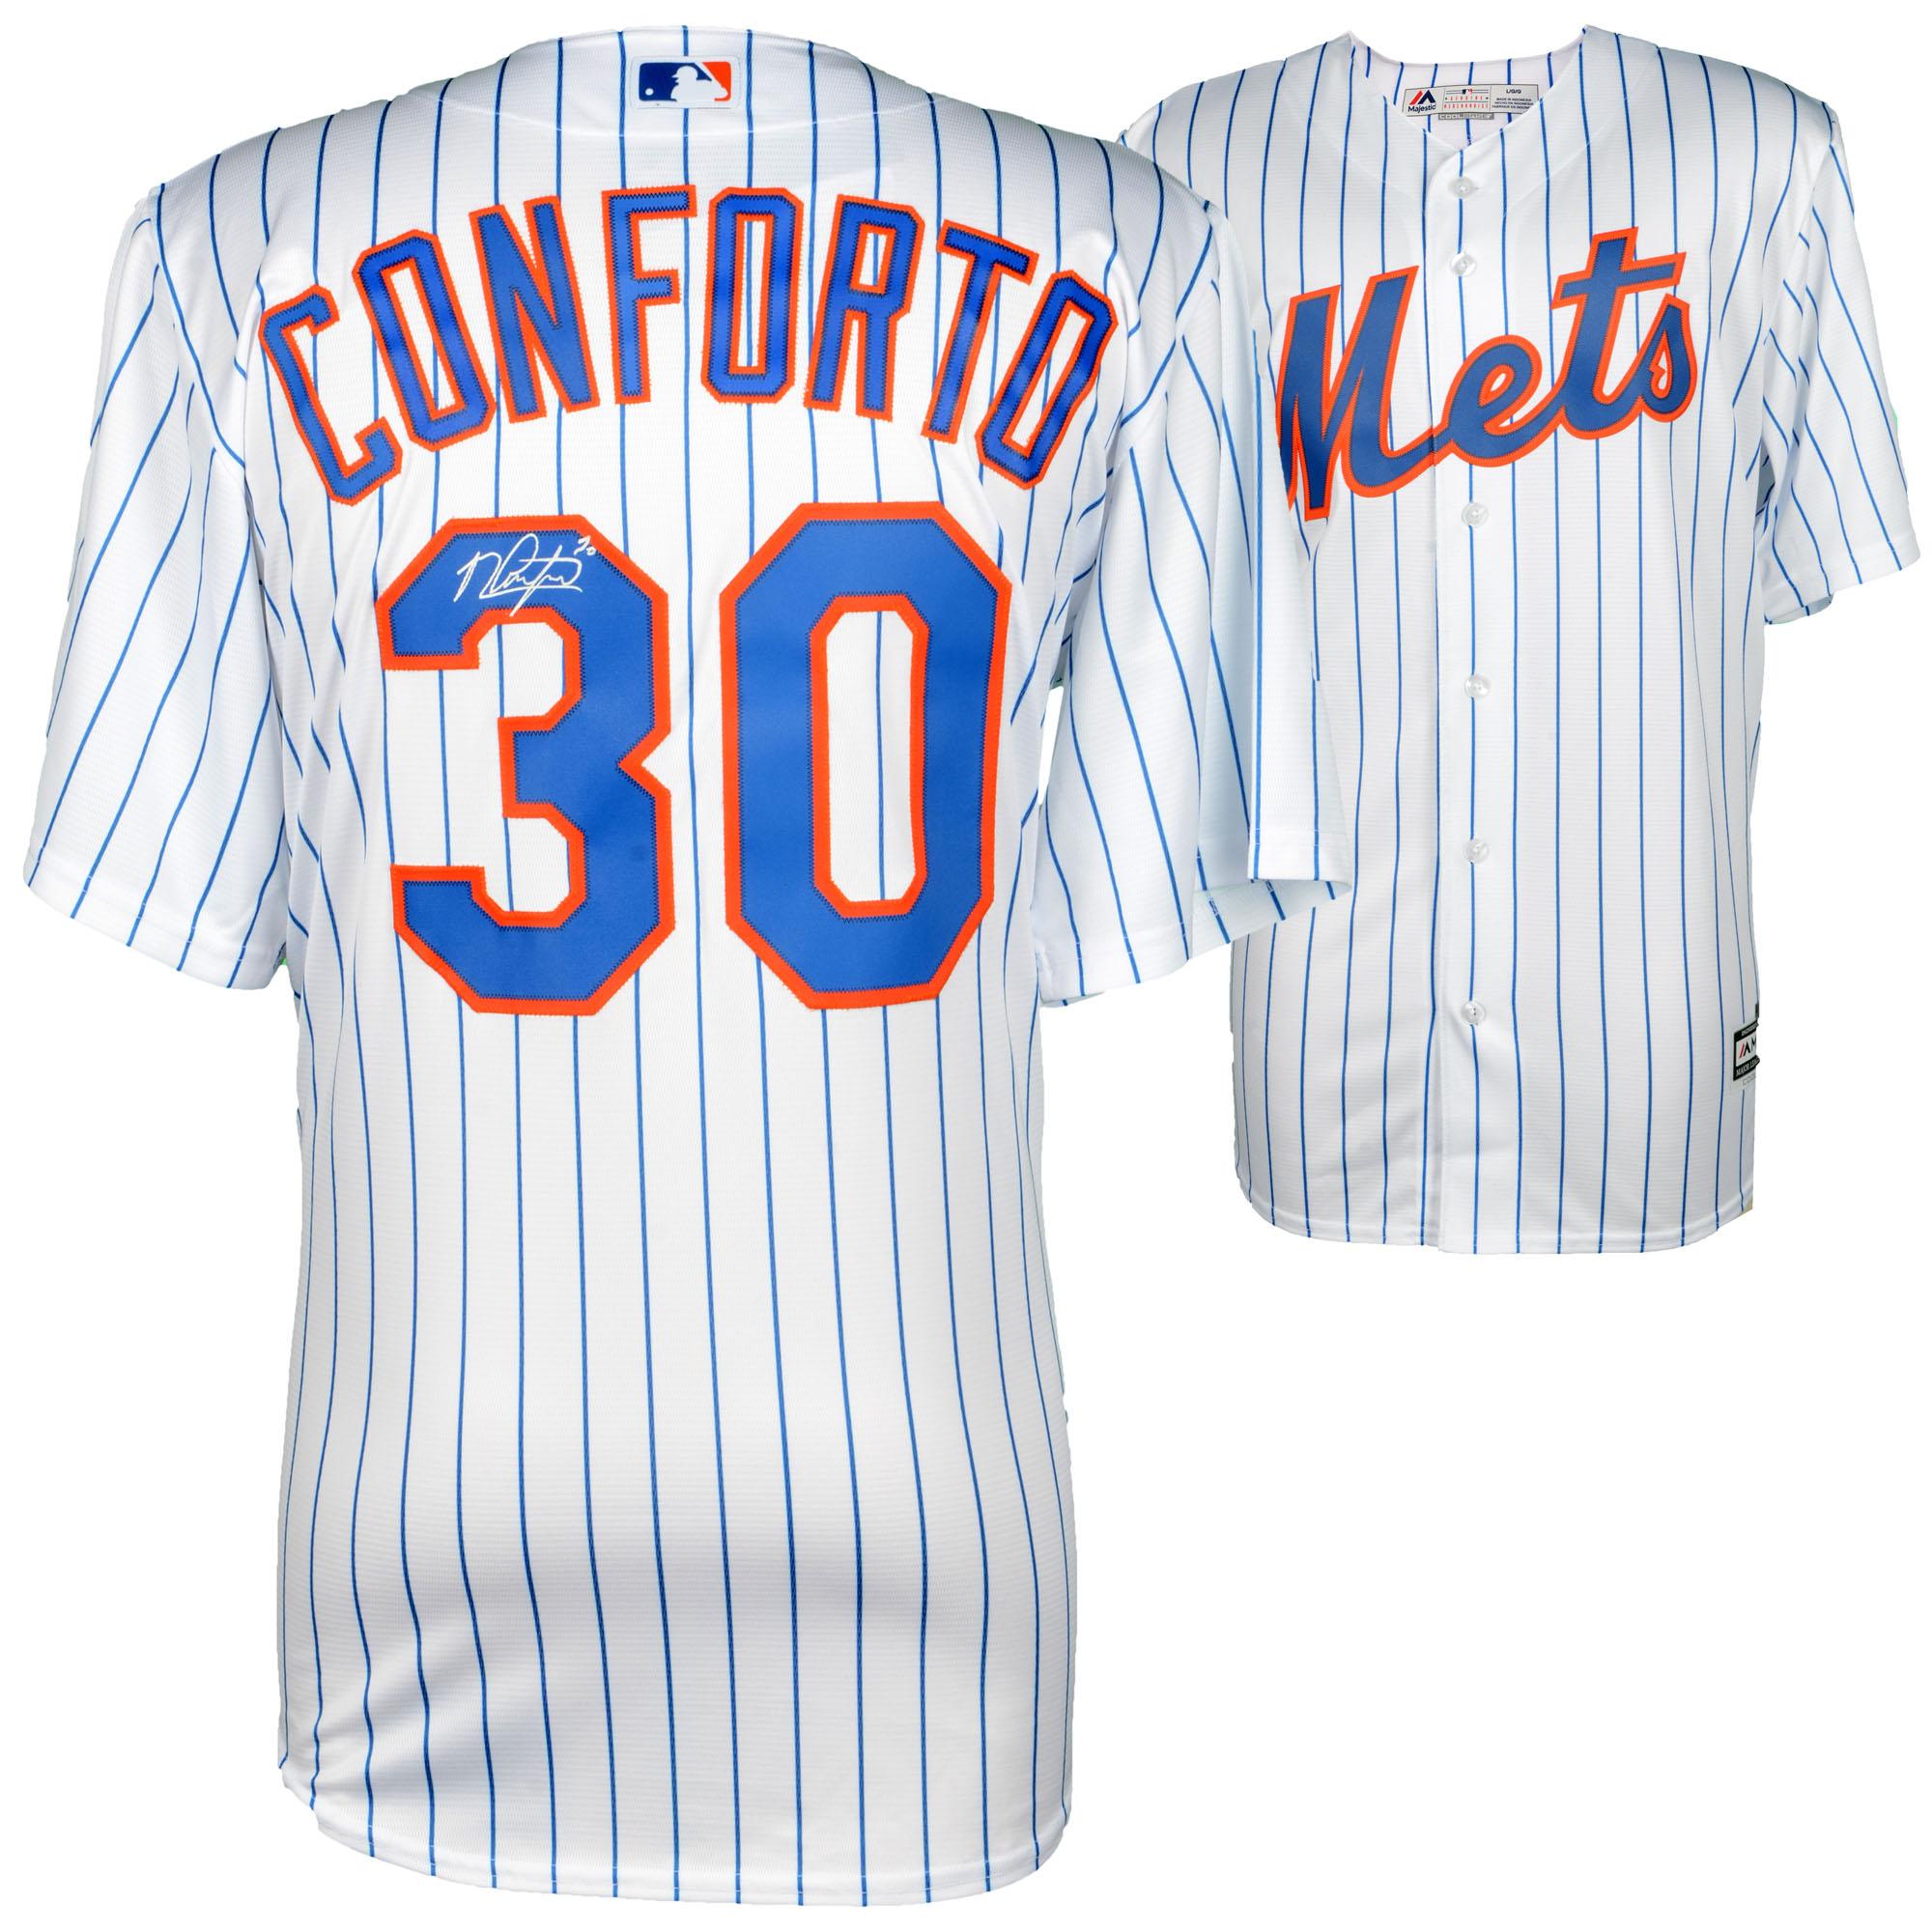 Michael Conforto New York Mets Fanatics Authentic Autographed Majestic White Replica Jersey - No Size